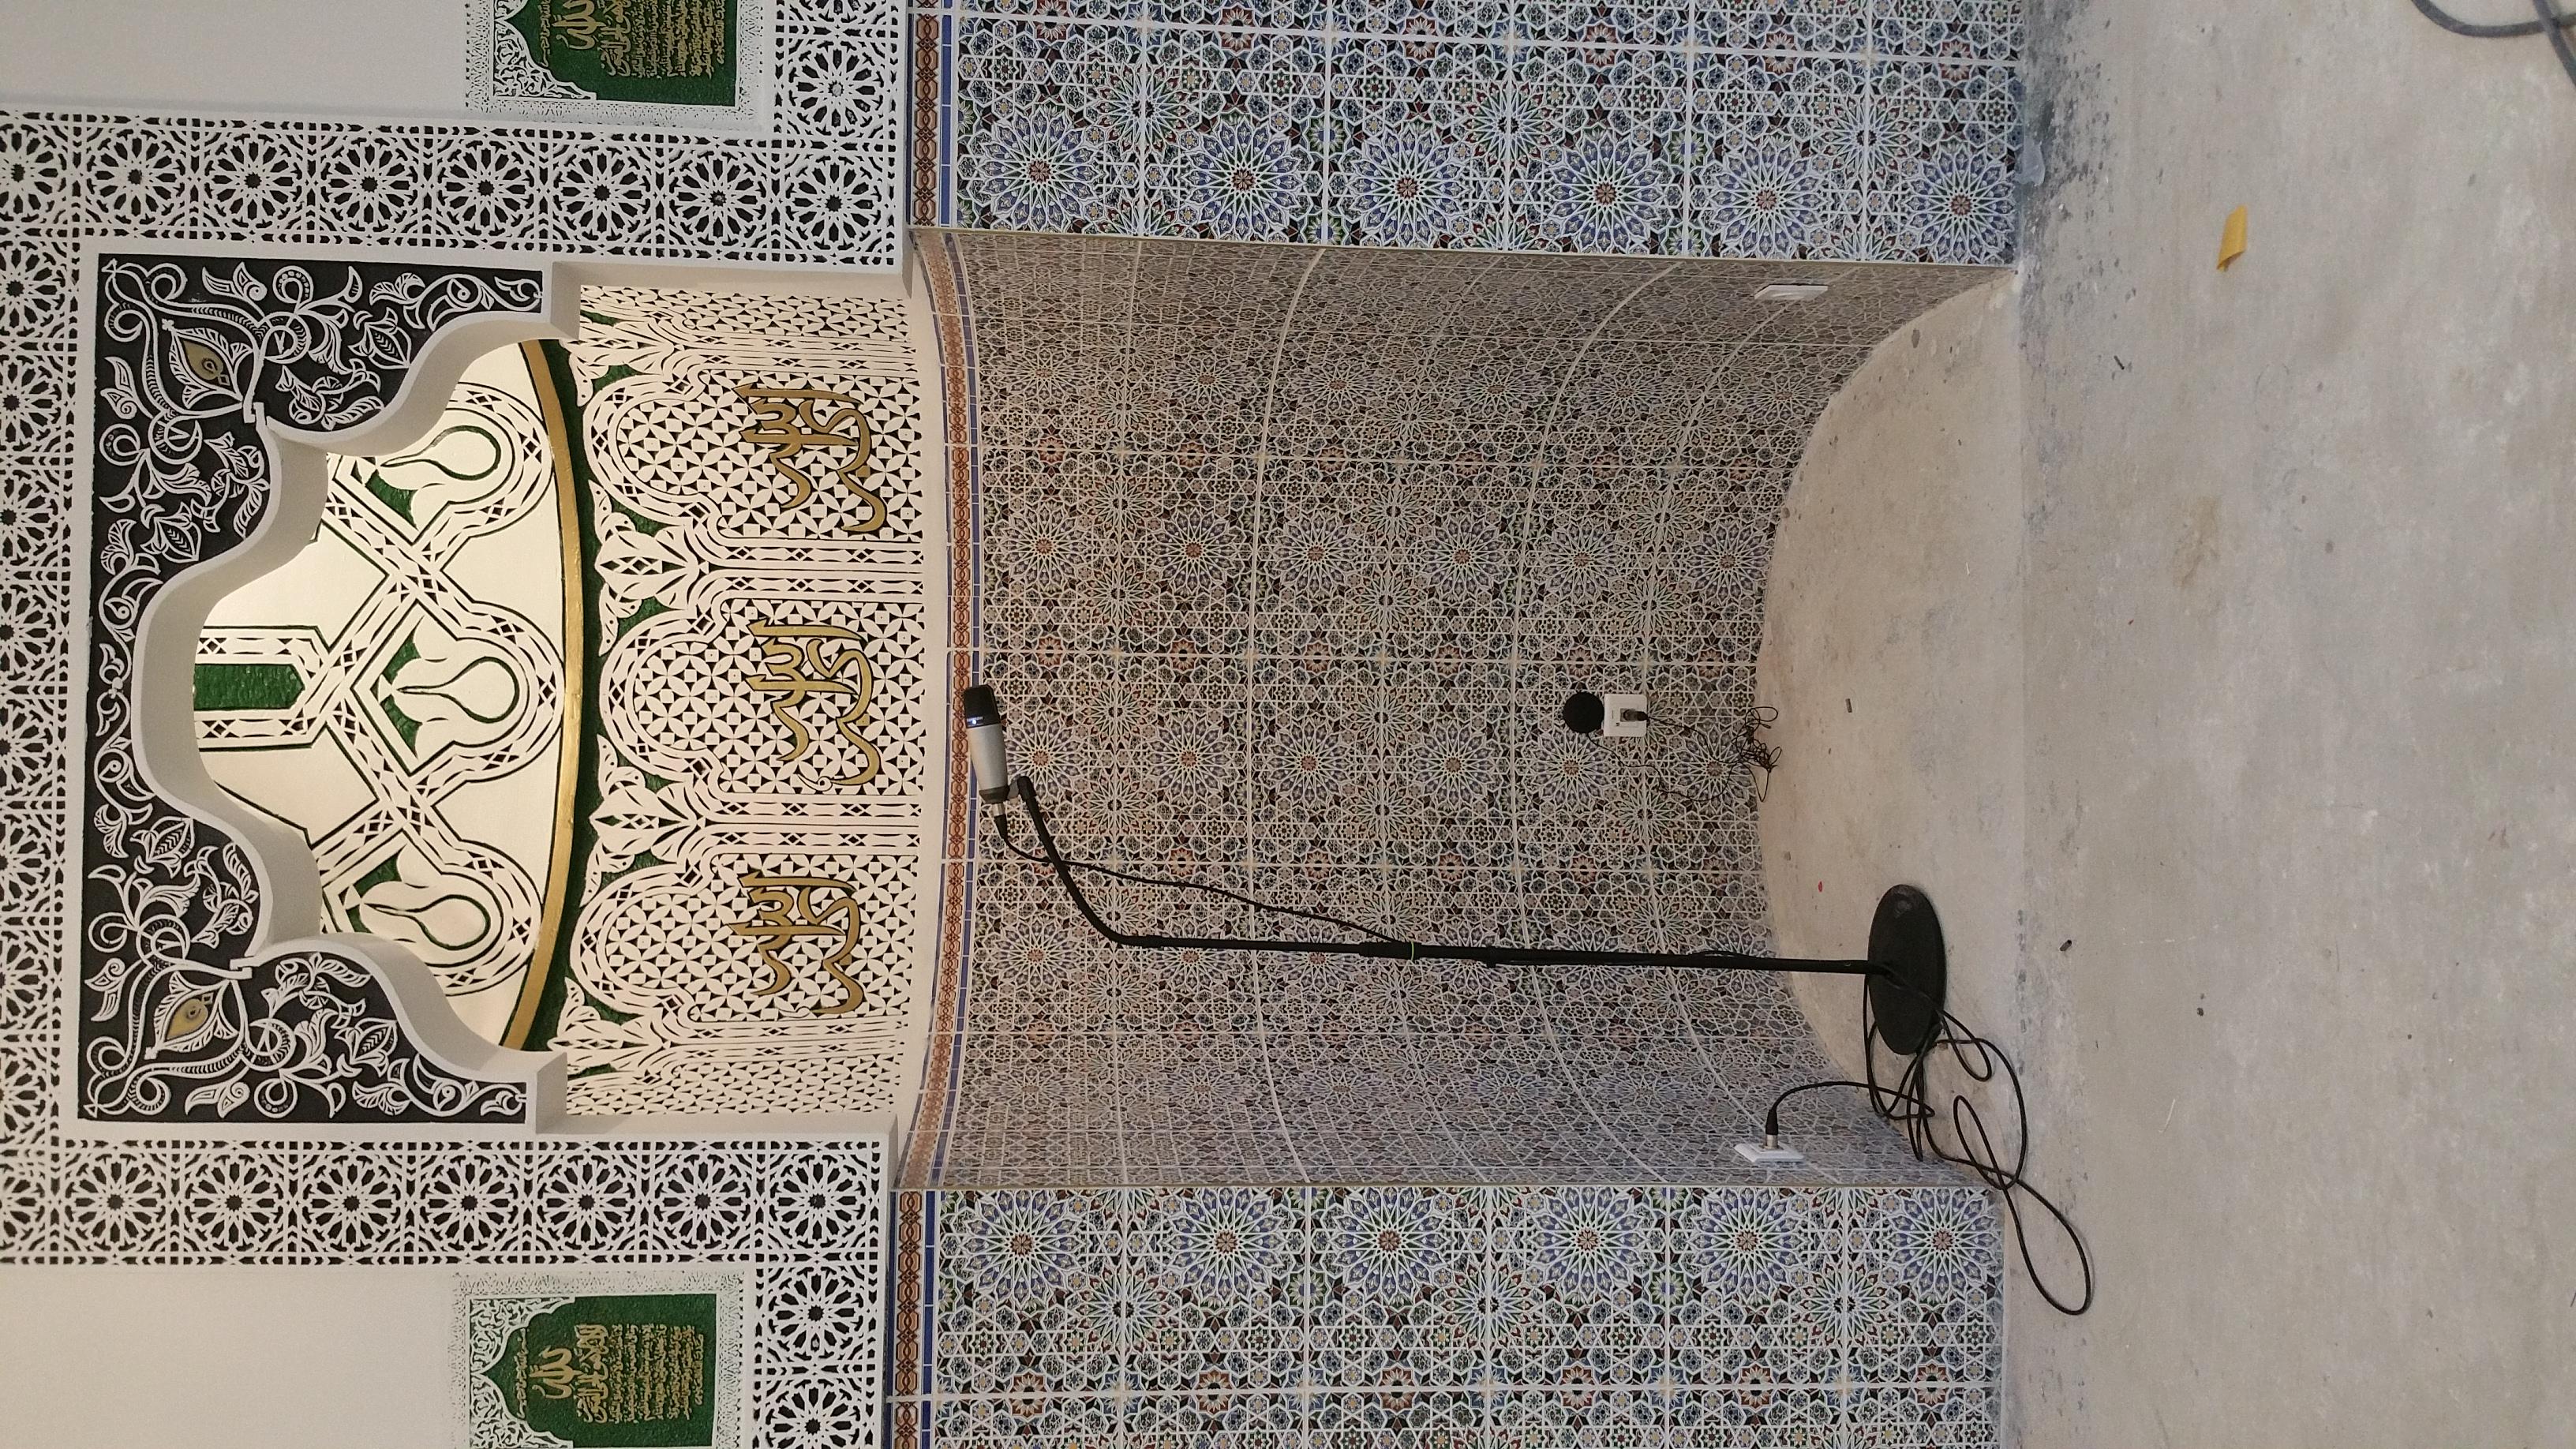 Micro salat mosquée de Rennes